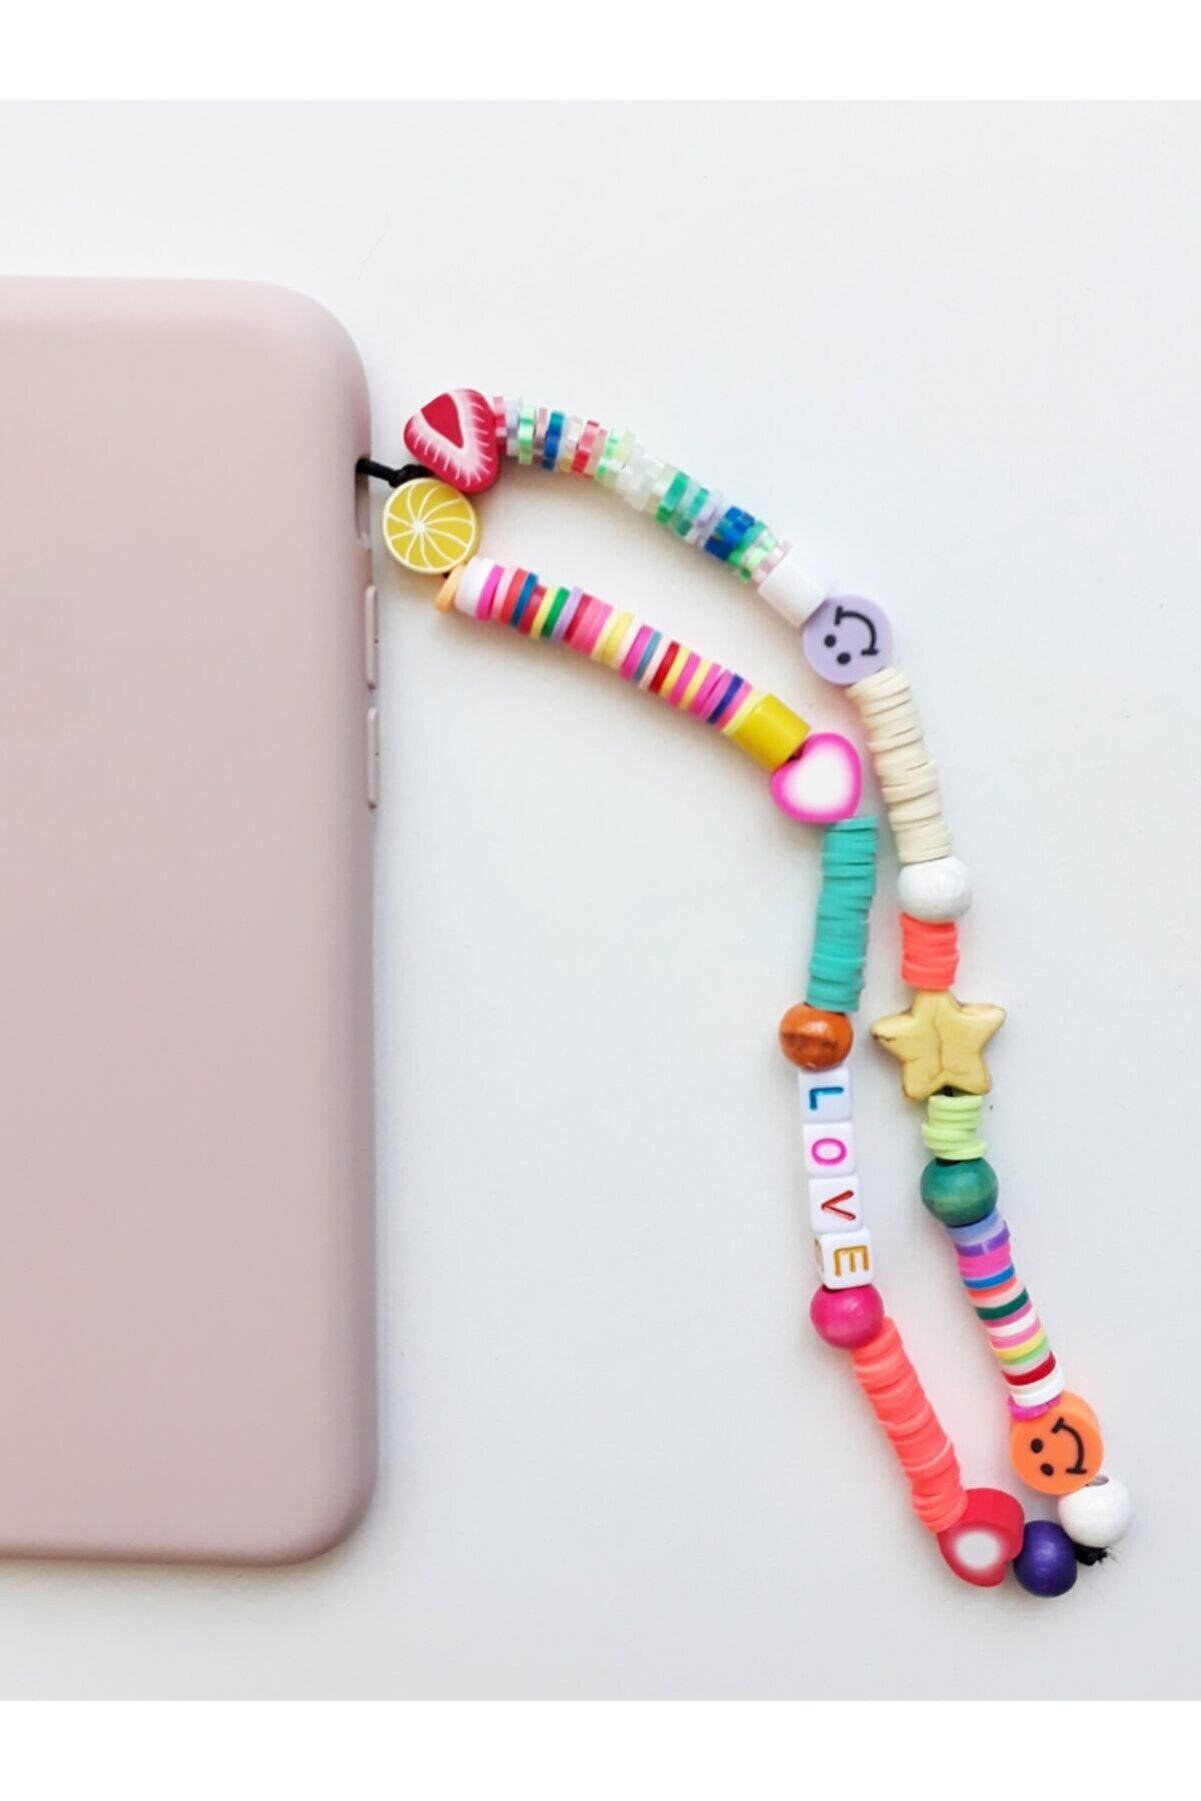 CR7 Renkli Love Desenli Telefon Charmı, Telefon Askısı Fimo